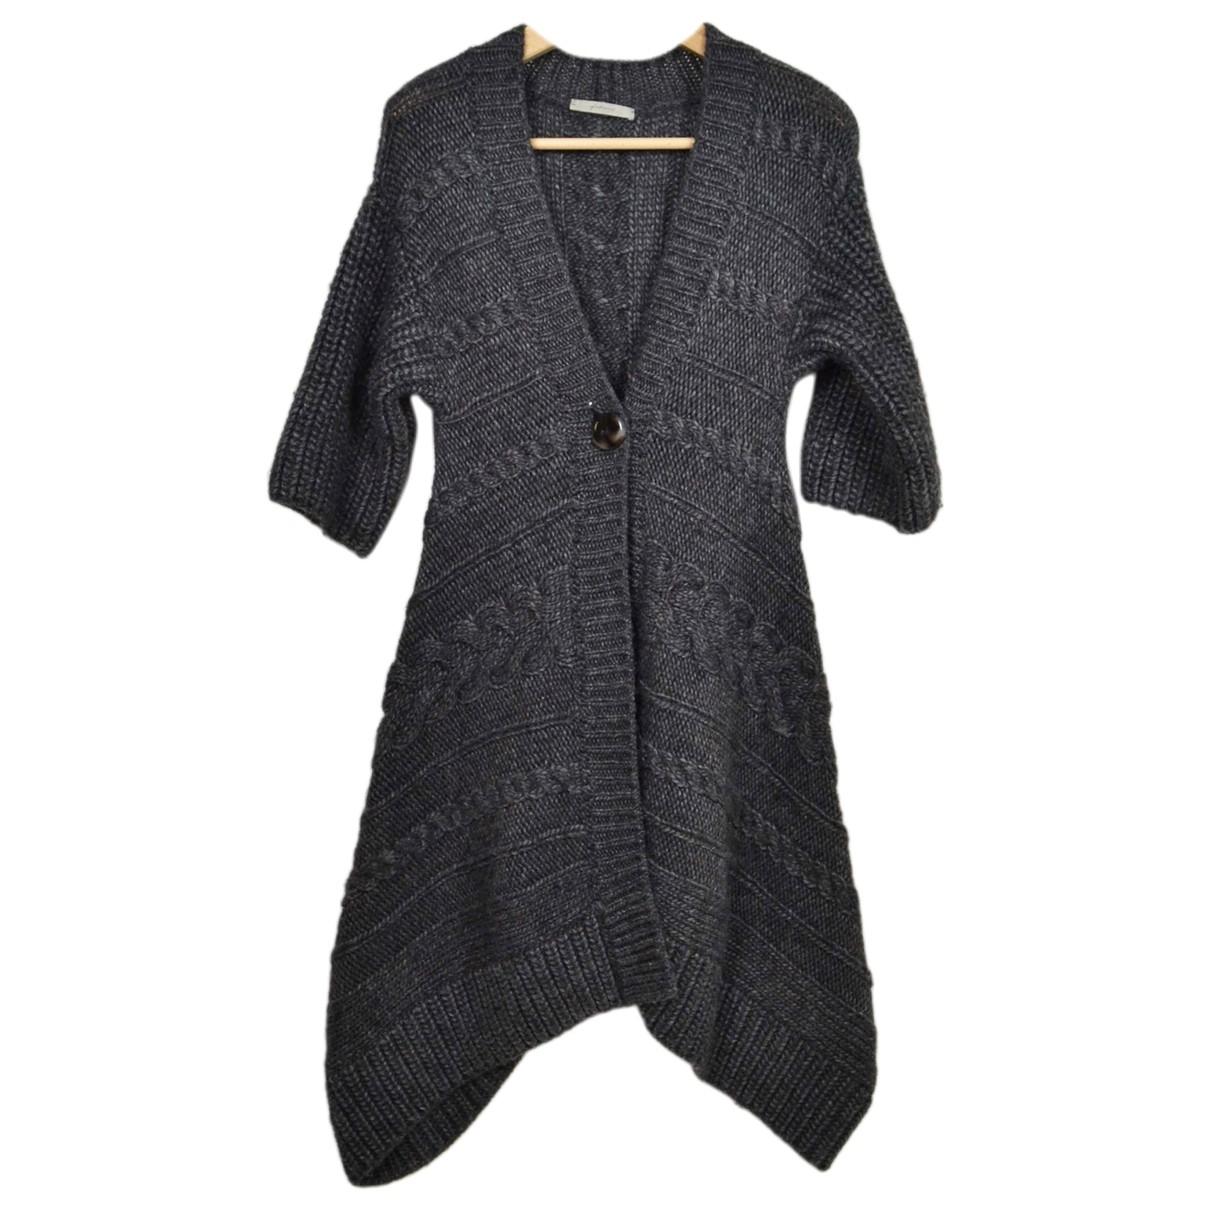 Falconeri \N Pullover in  Grau Wolle